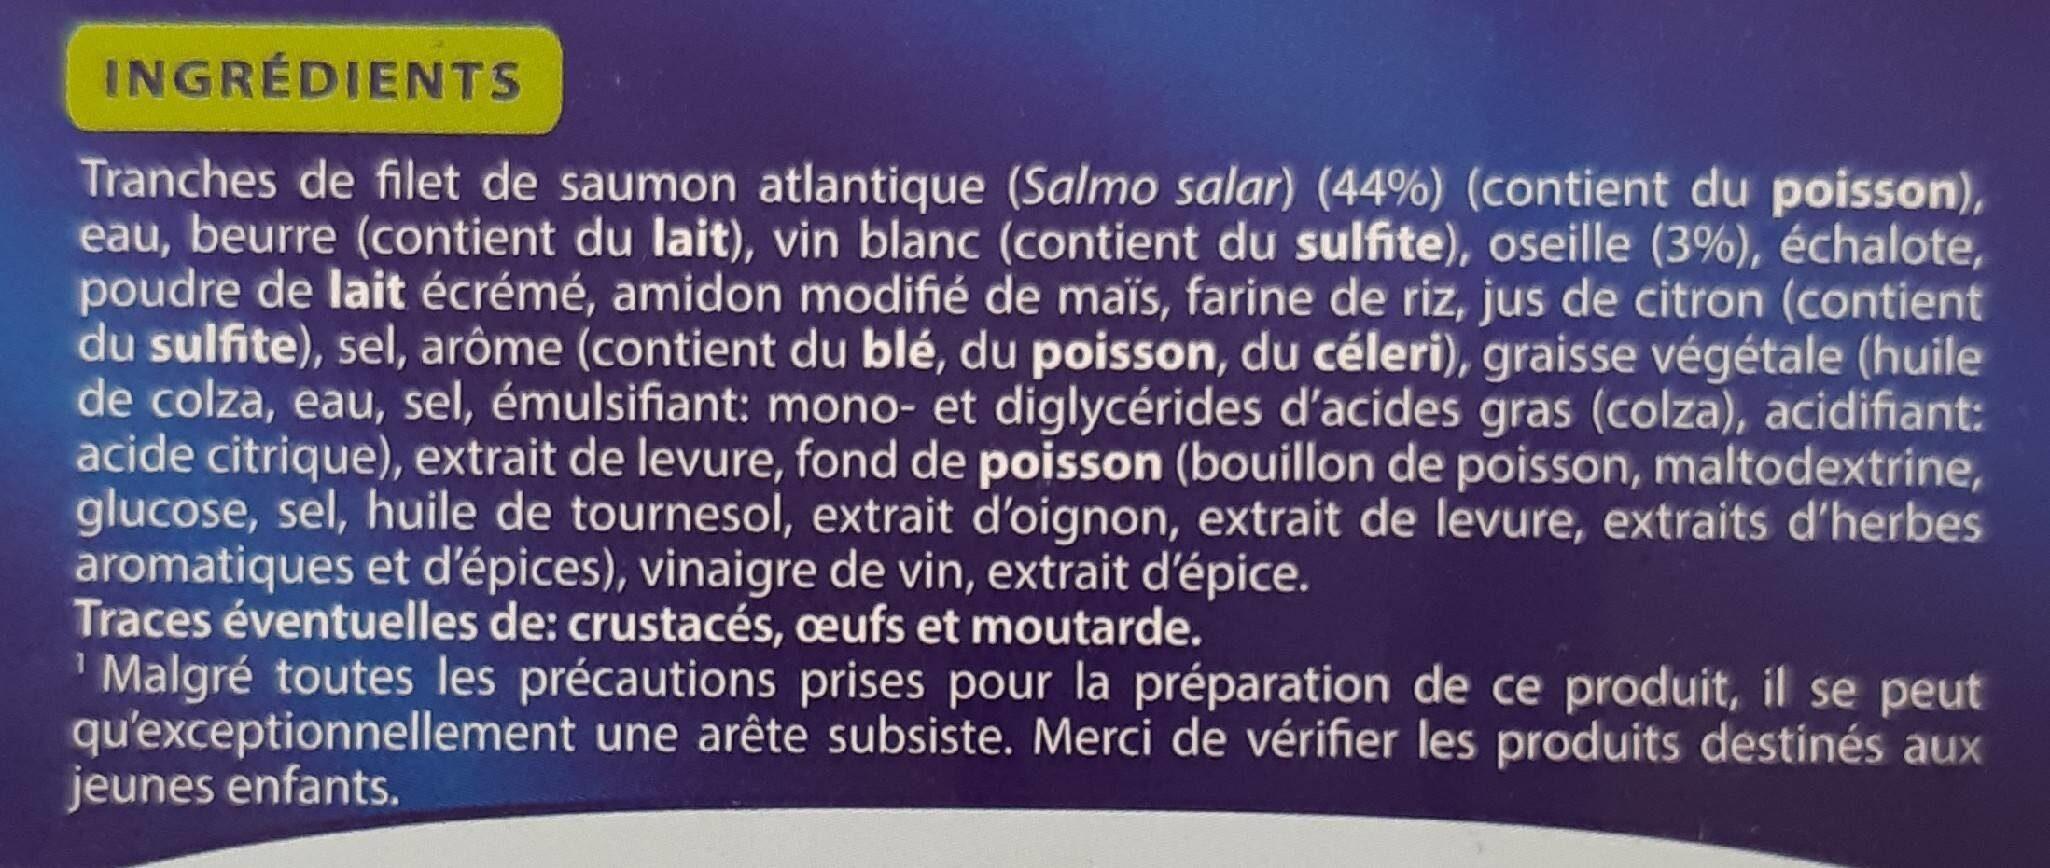 Saumon atlantique sauce oseille, Surgelé - Ingrediënten